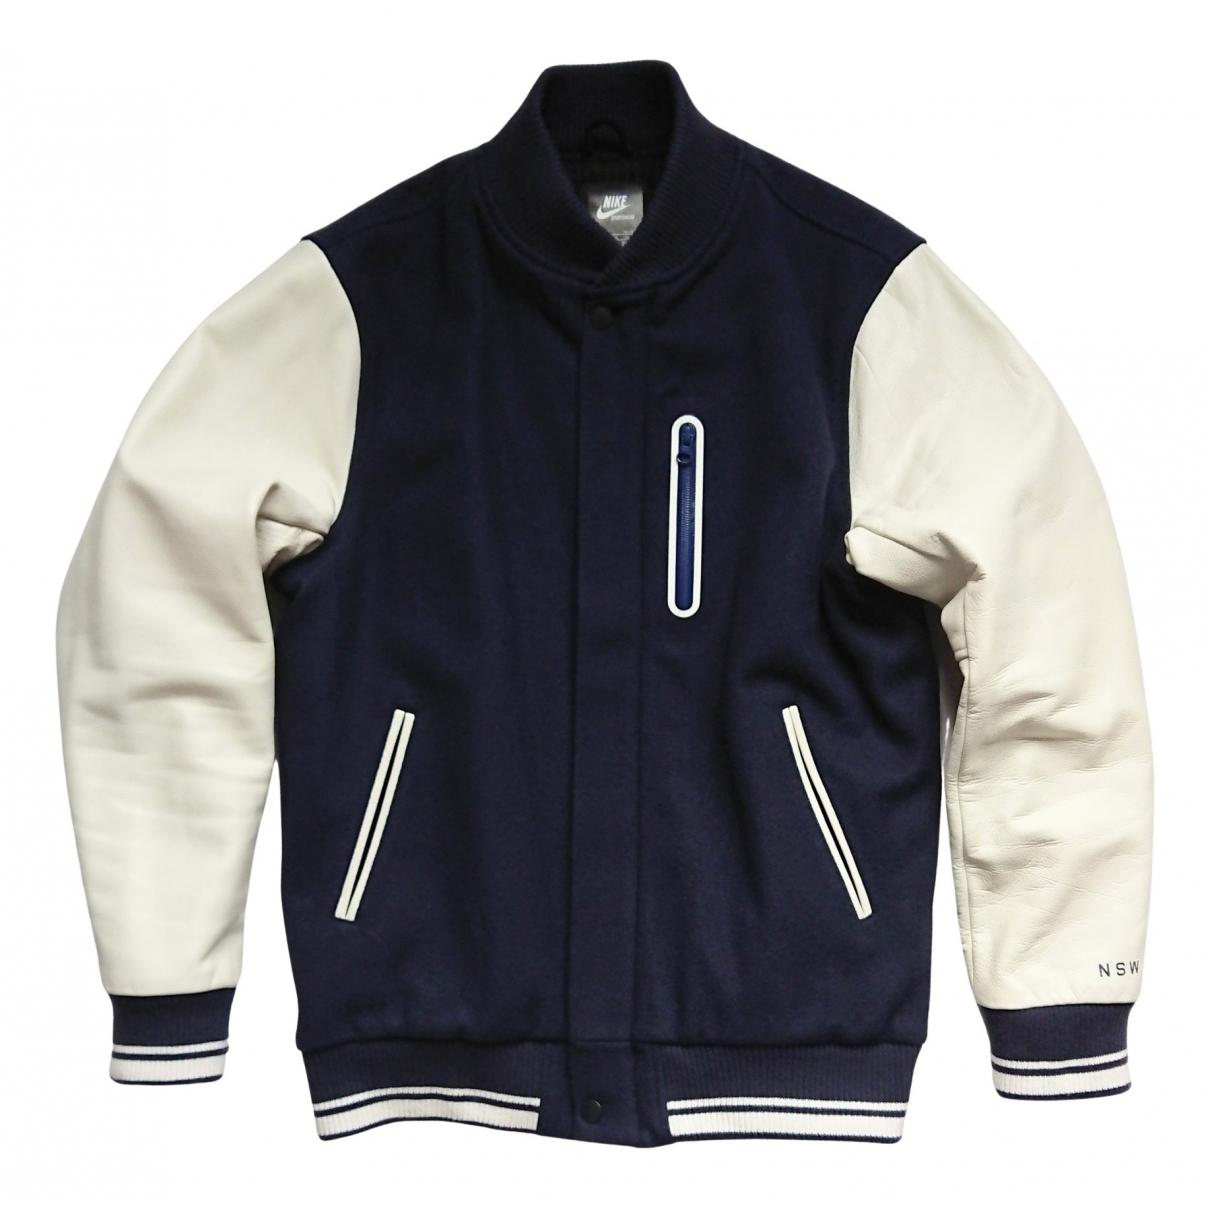 Nike \N Jacke in  Blau Wolle